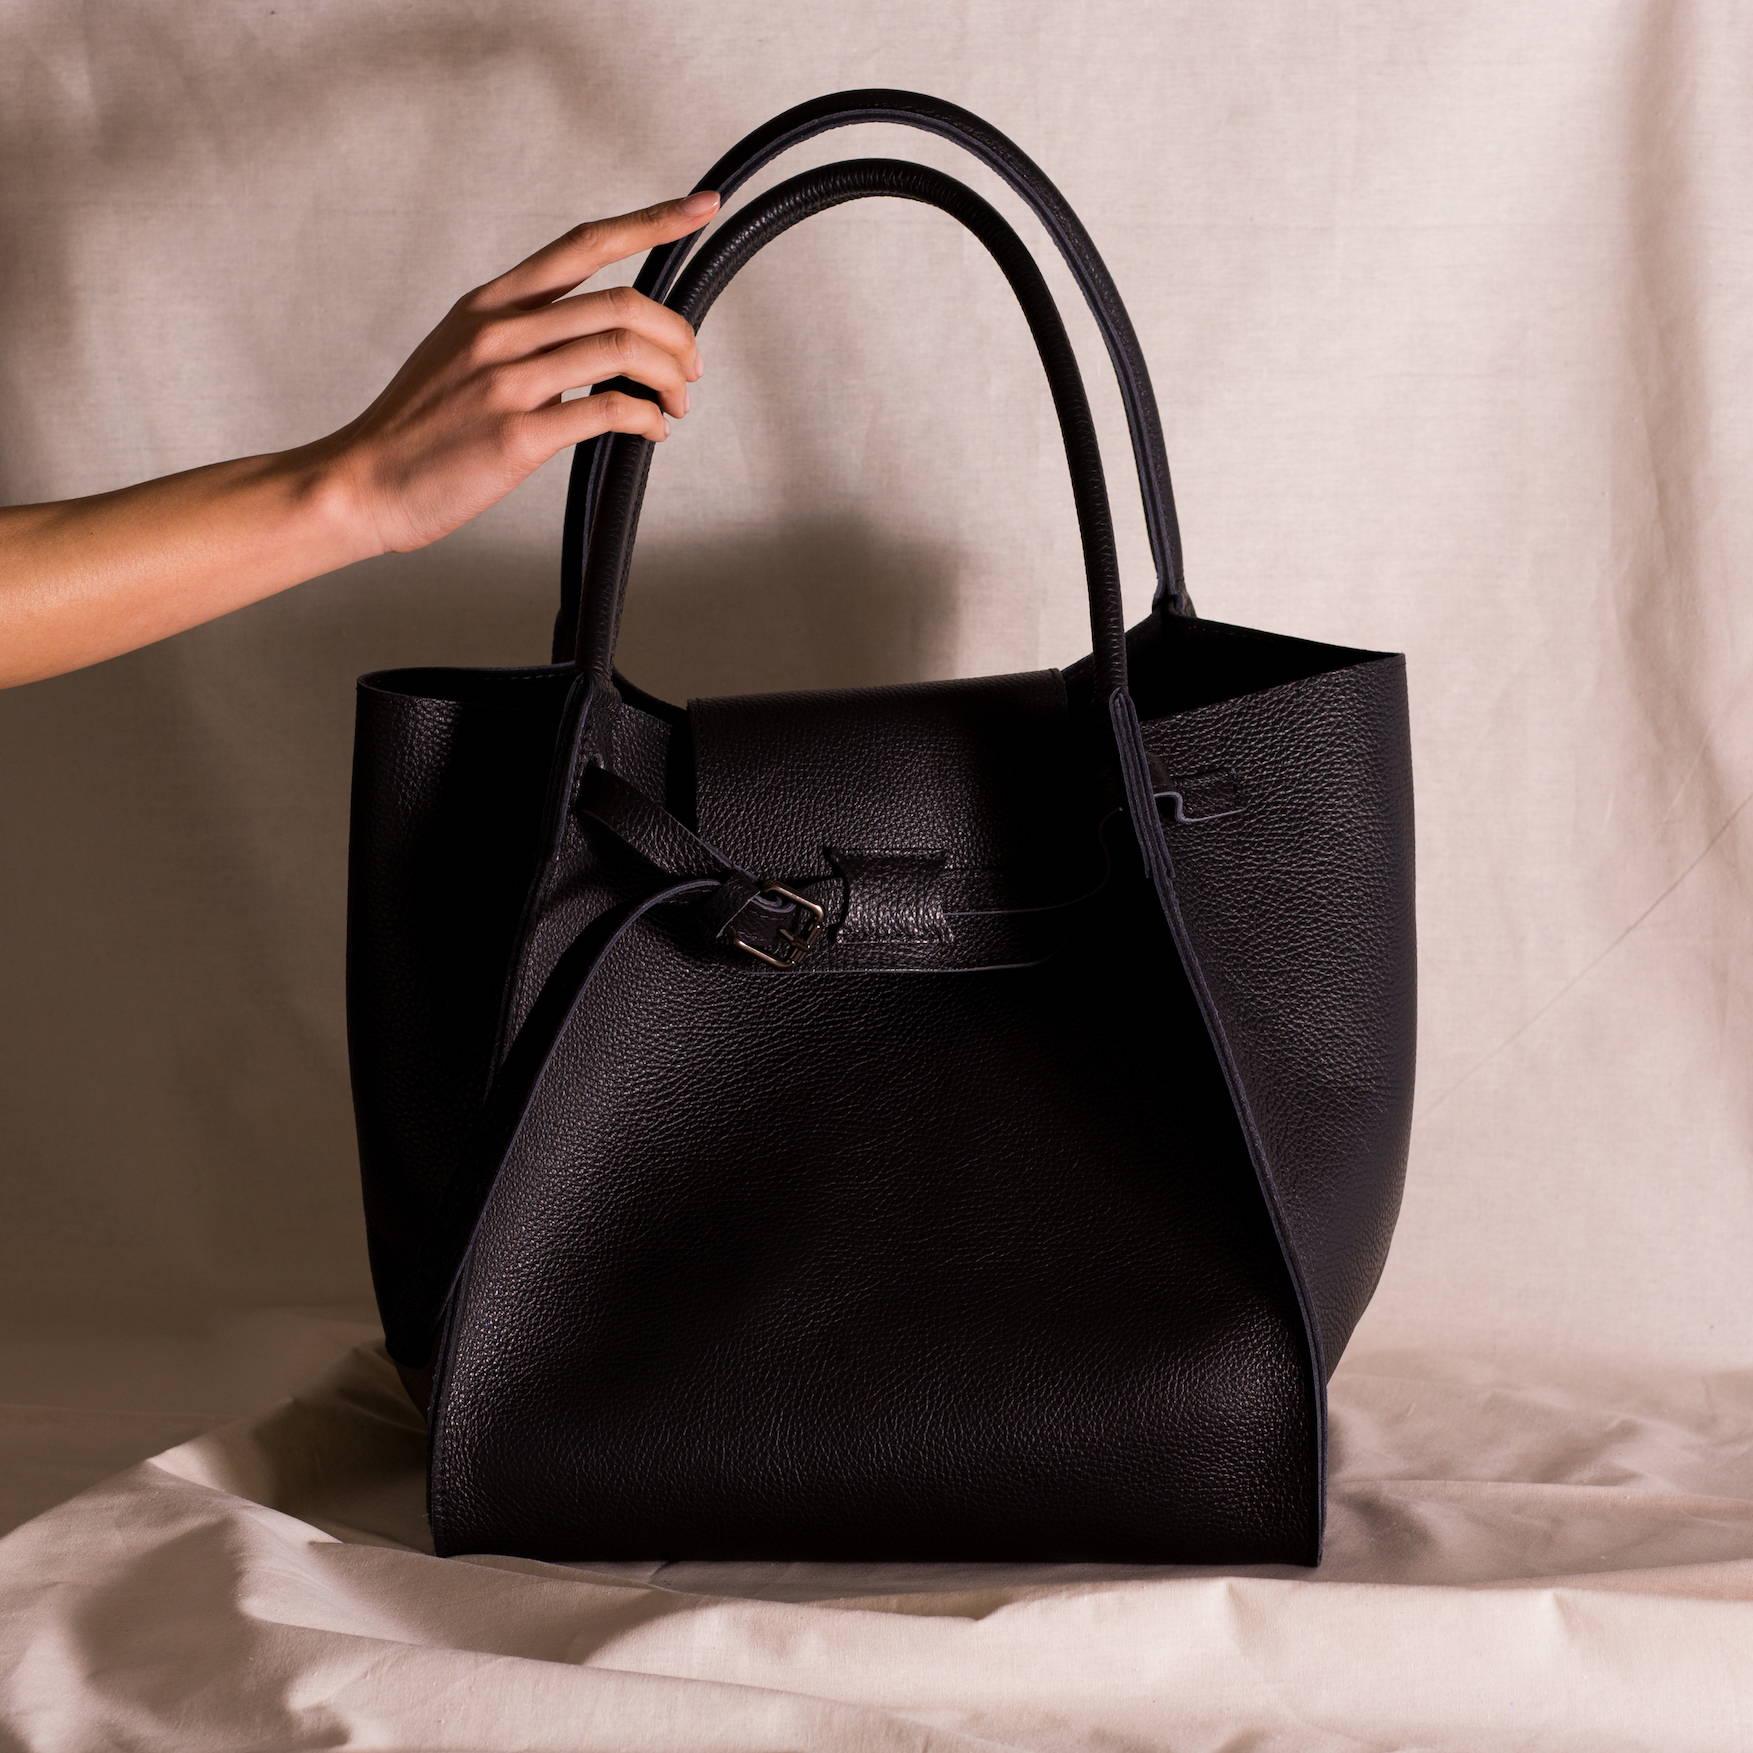 VESTIRSI leather handbag handmade in Italy SIMONE full grain Italian leather black handbag